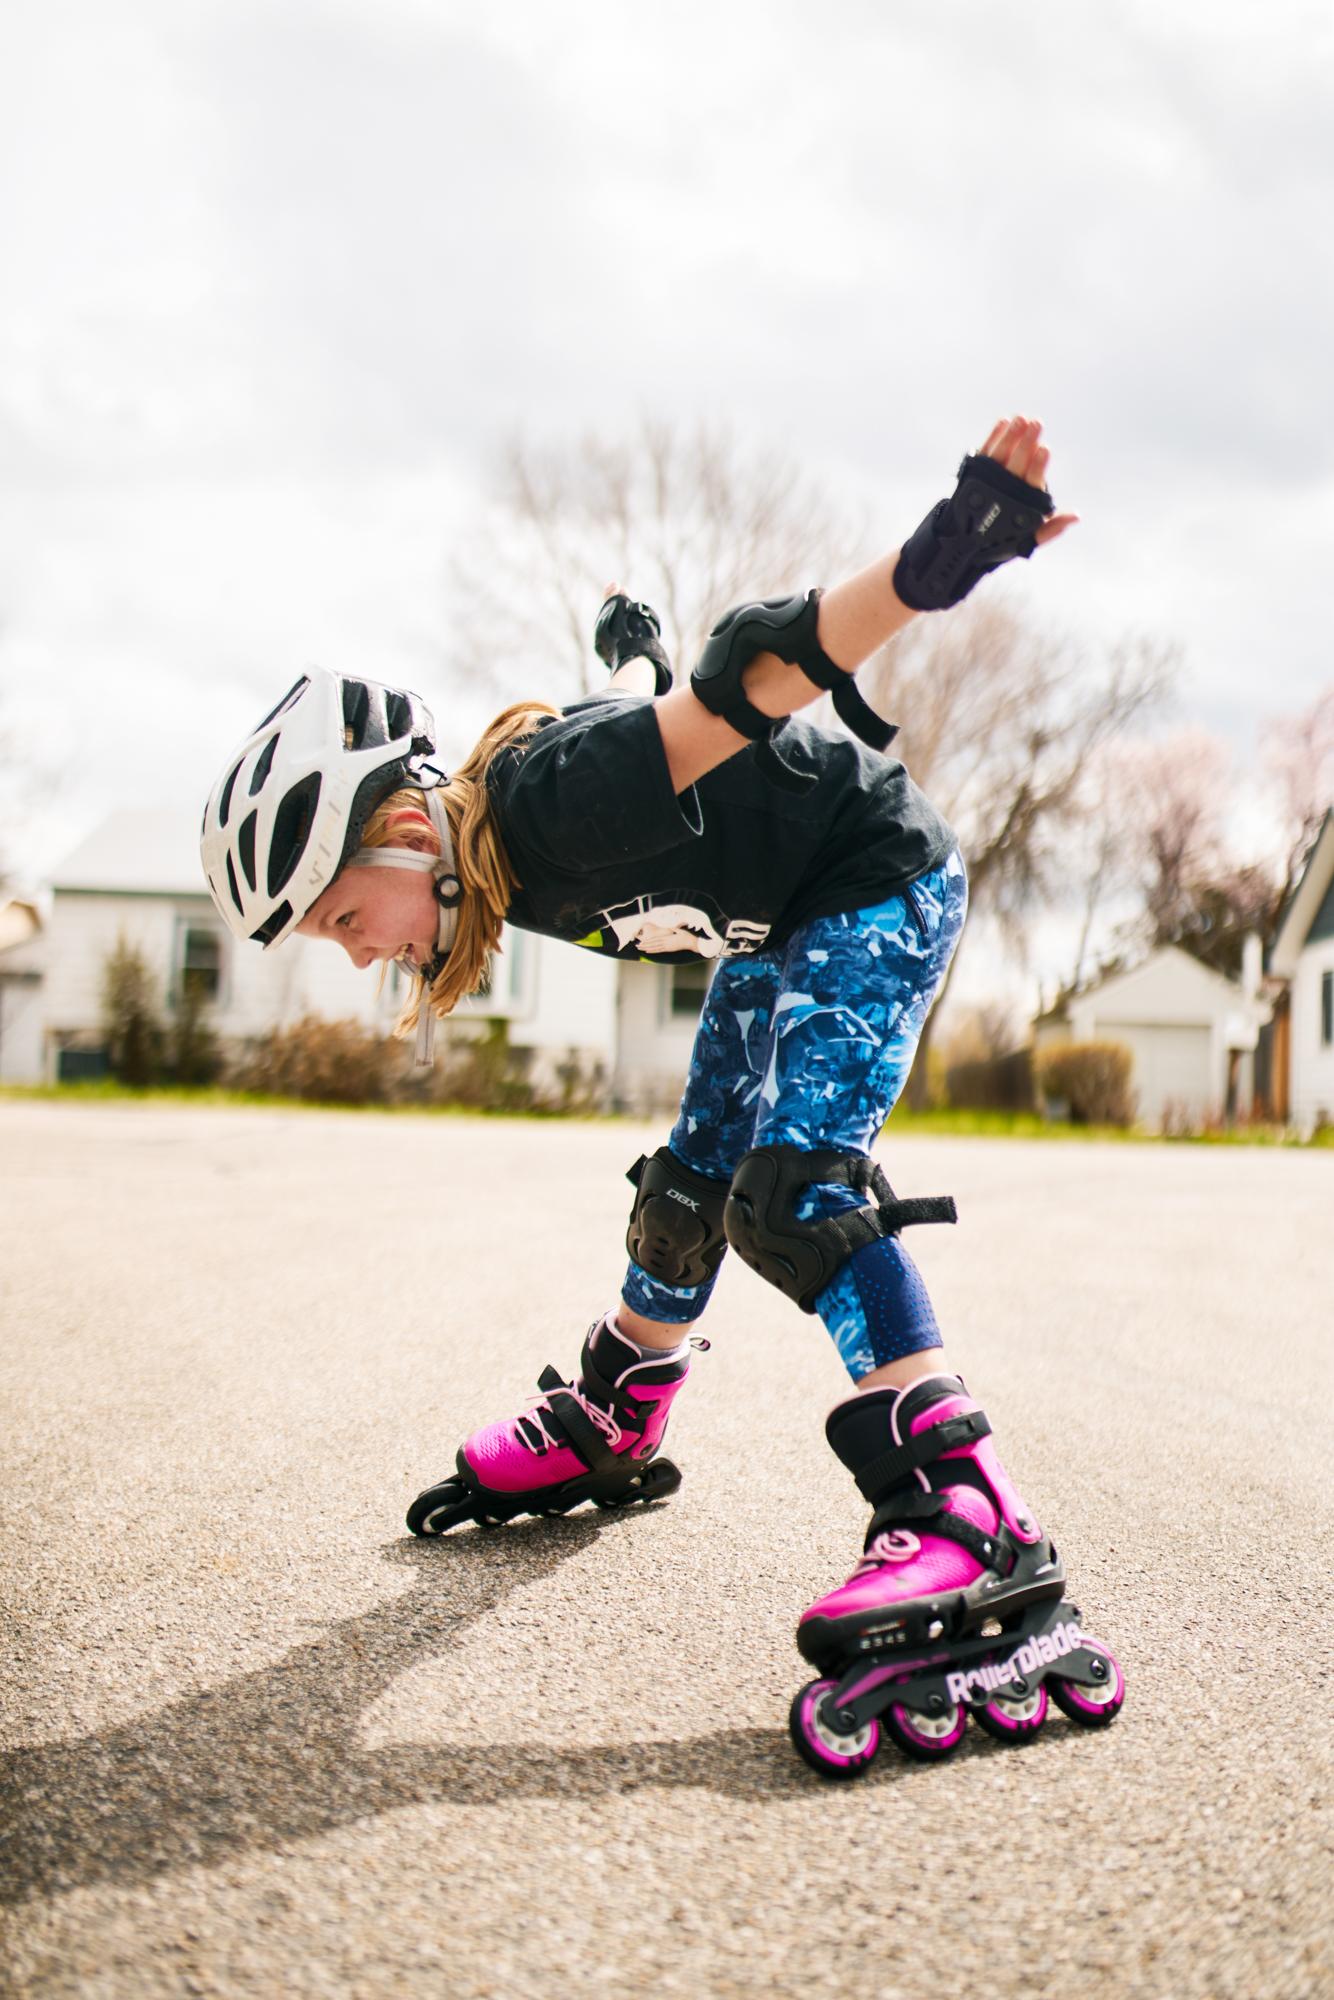 2019-4-6 Zoe Rollerblading-018 copy.jpg